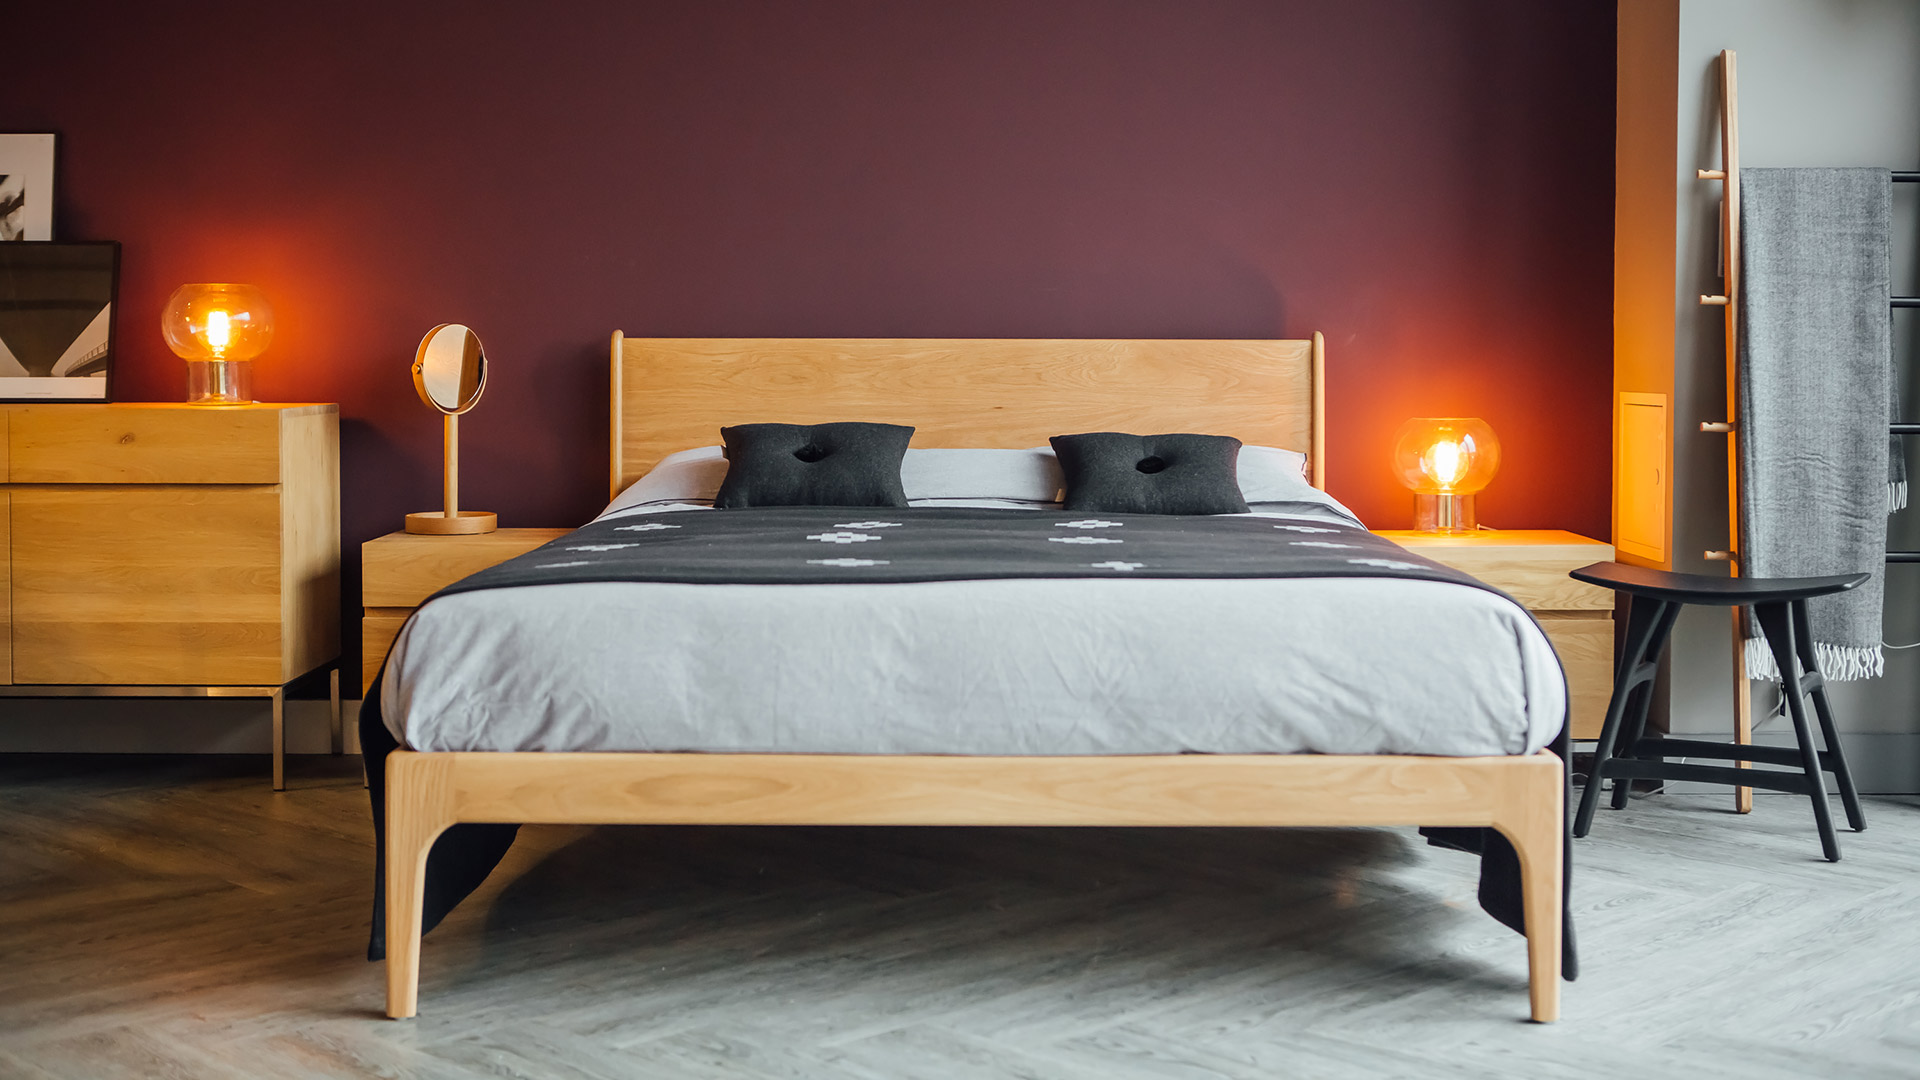 Camden bed in King size handmade in the UK